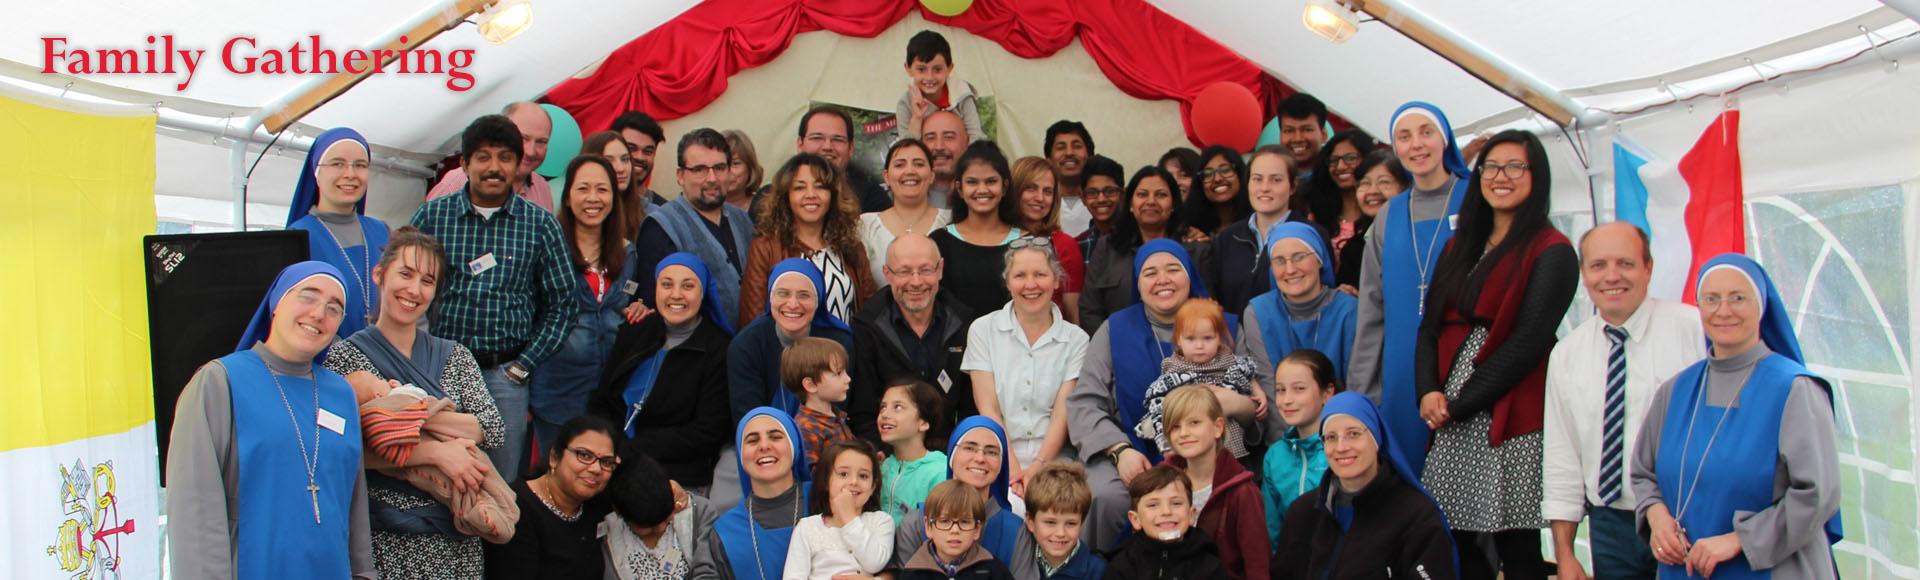 IVE-SSVM-Family-Gathering-2016